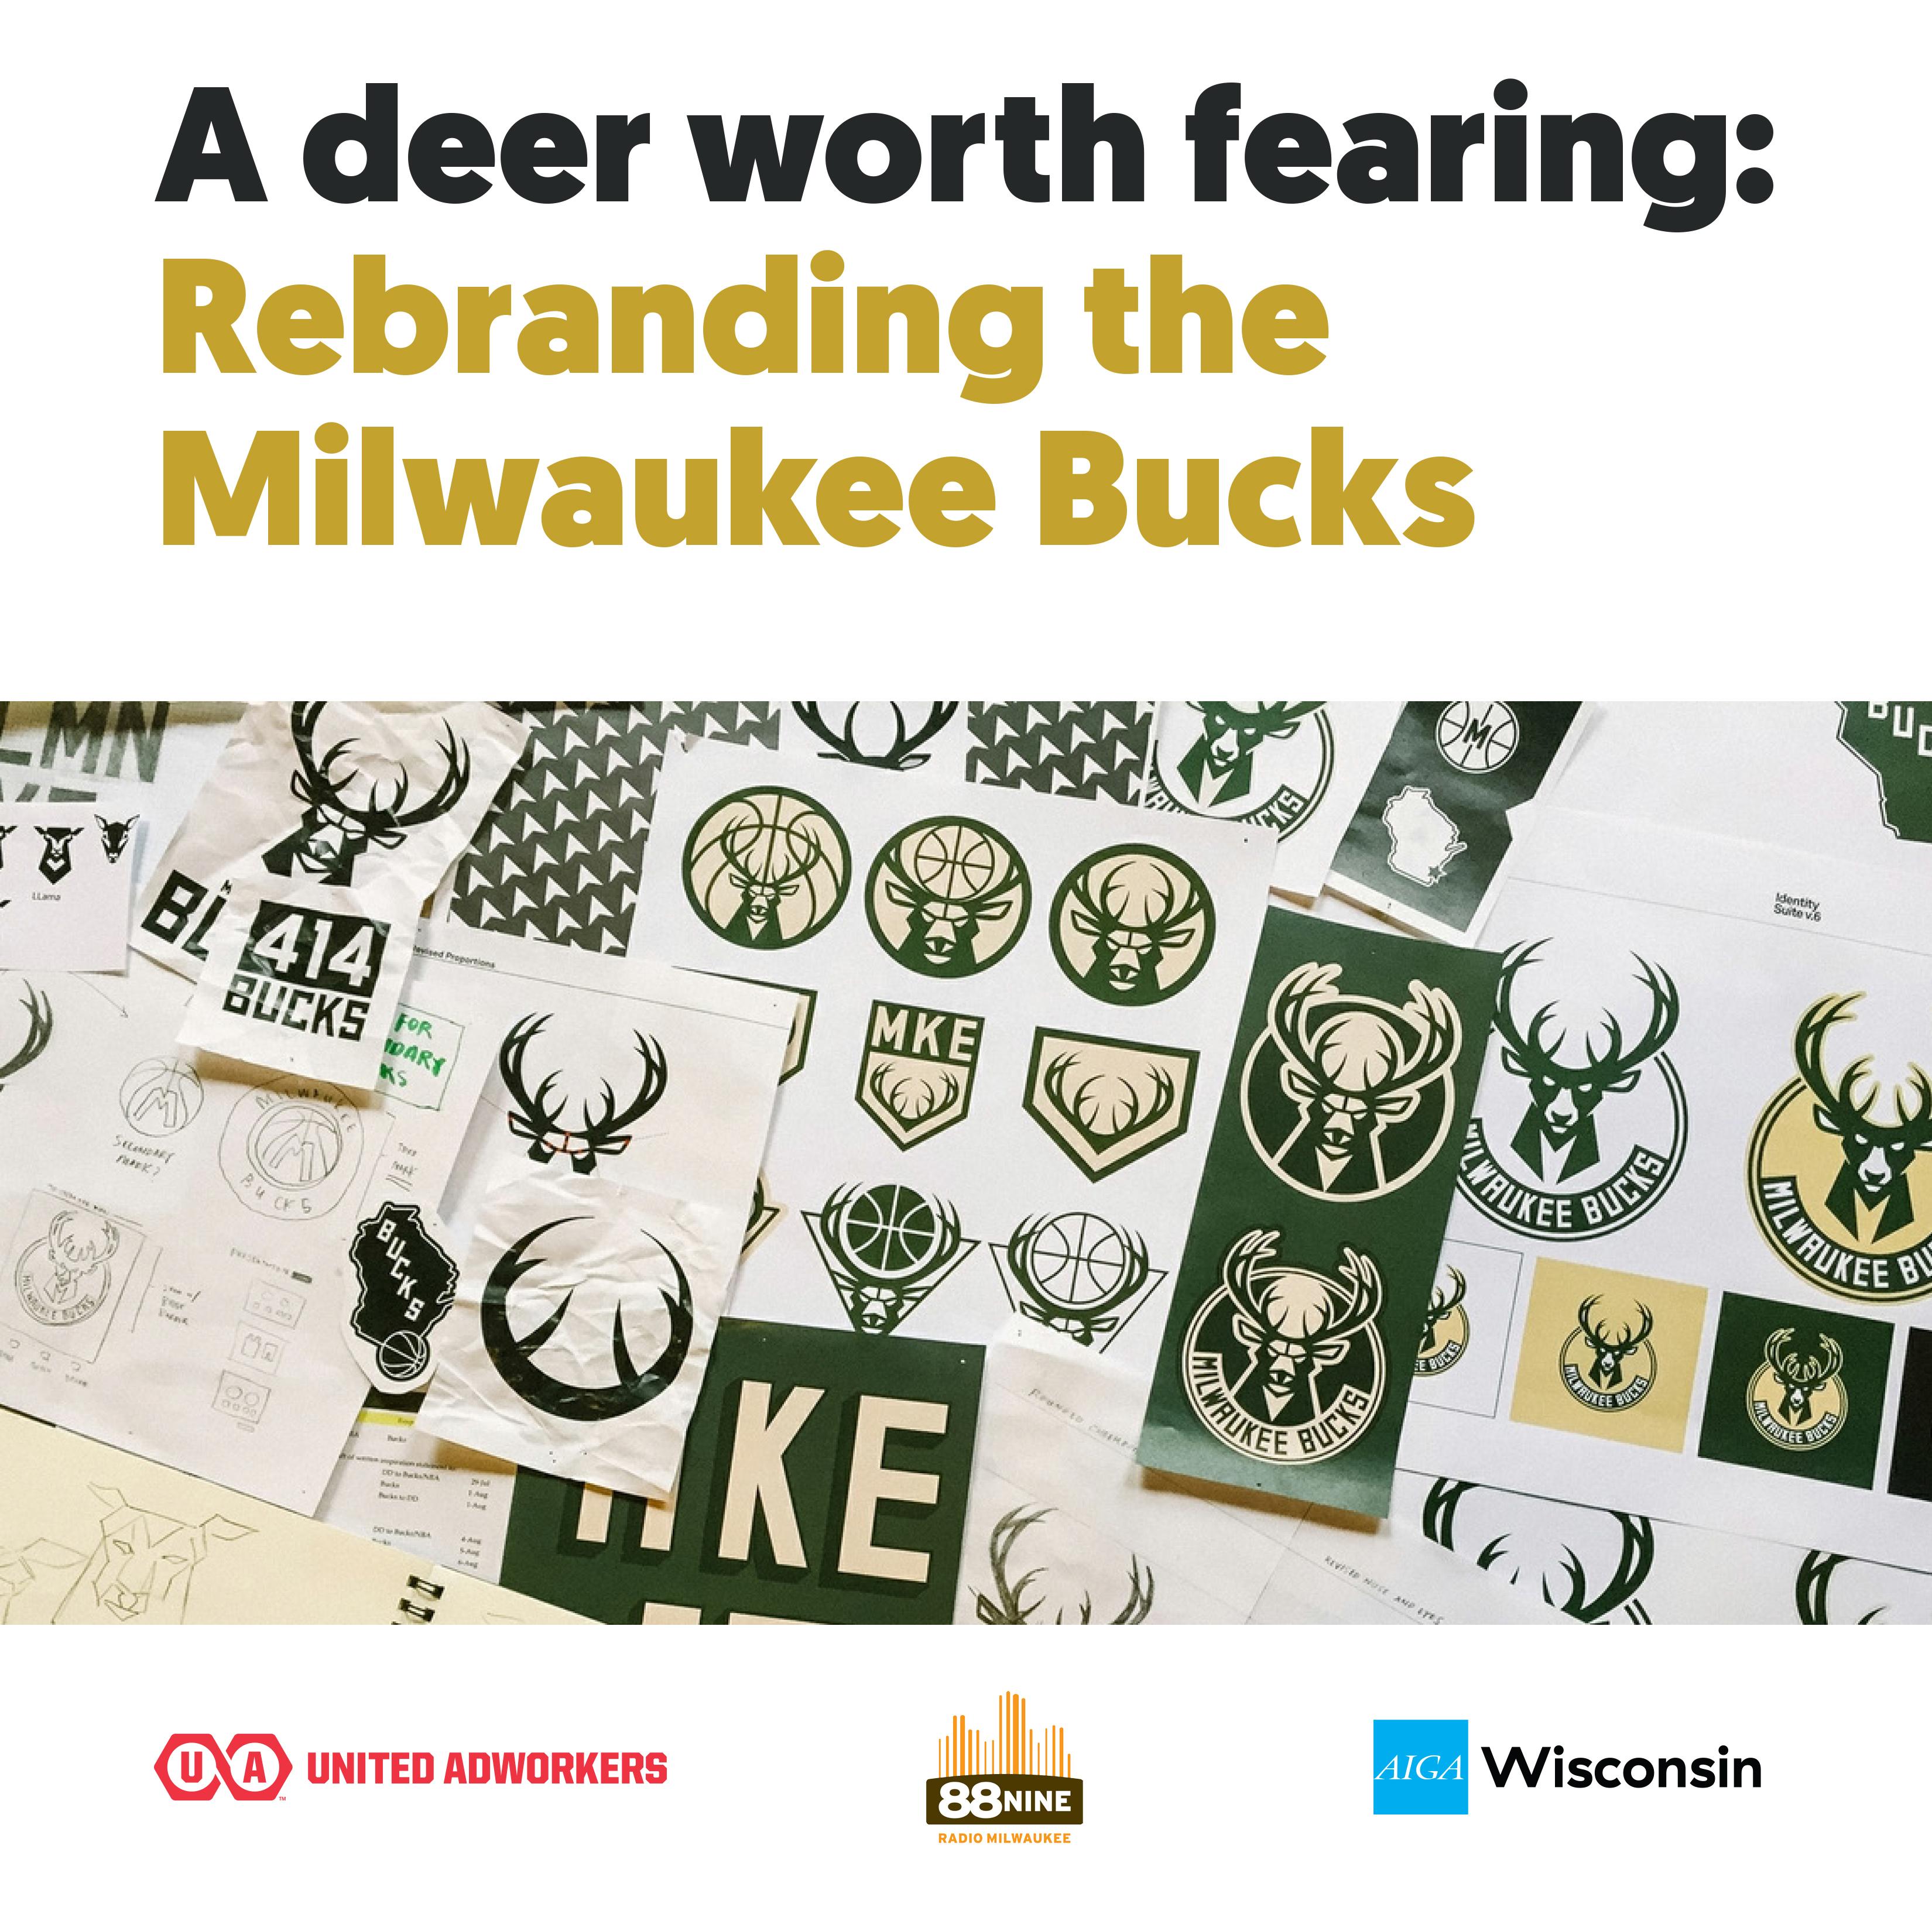 A Deer Worth Fearing: Rebranding the Milwaukee Bucks